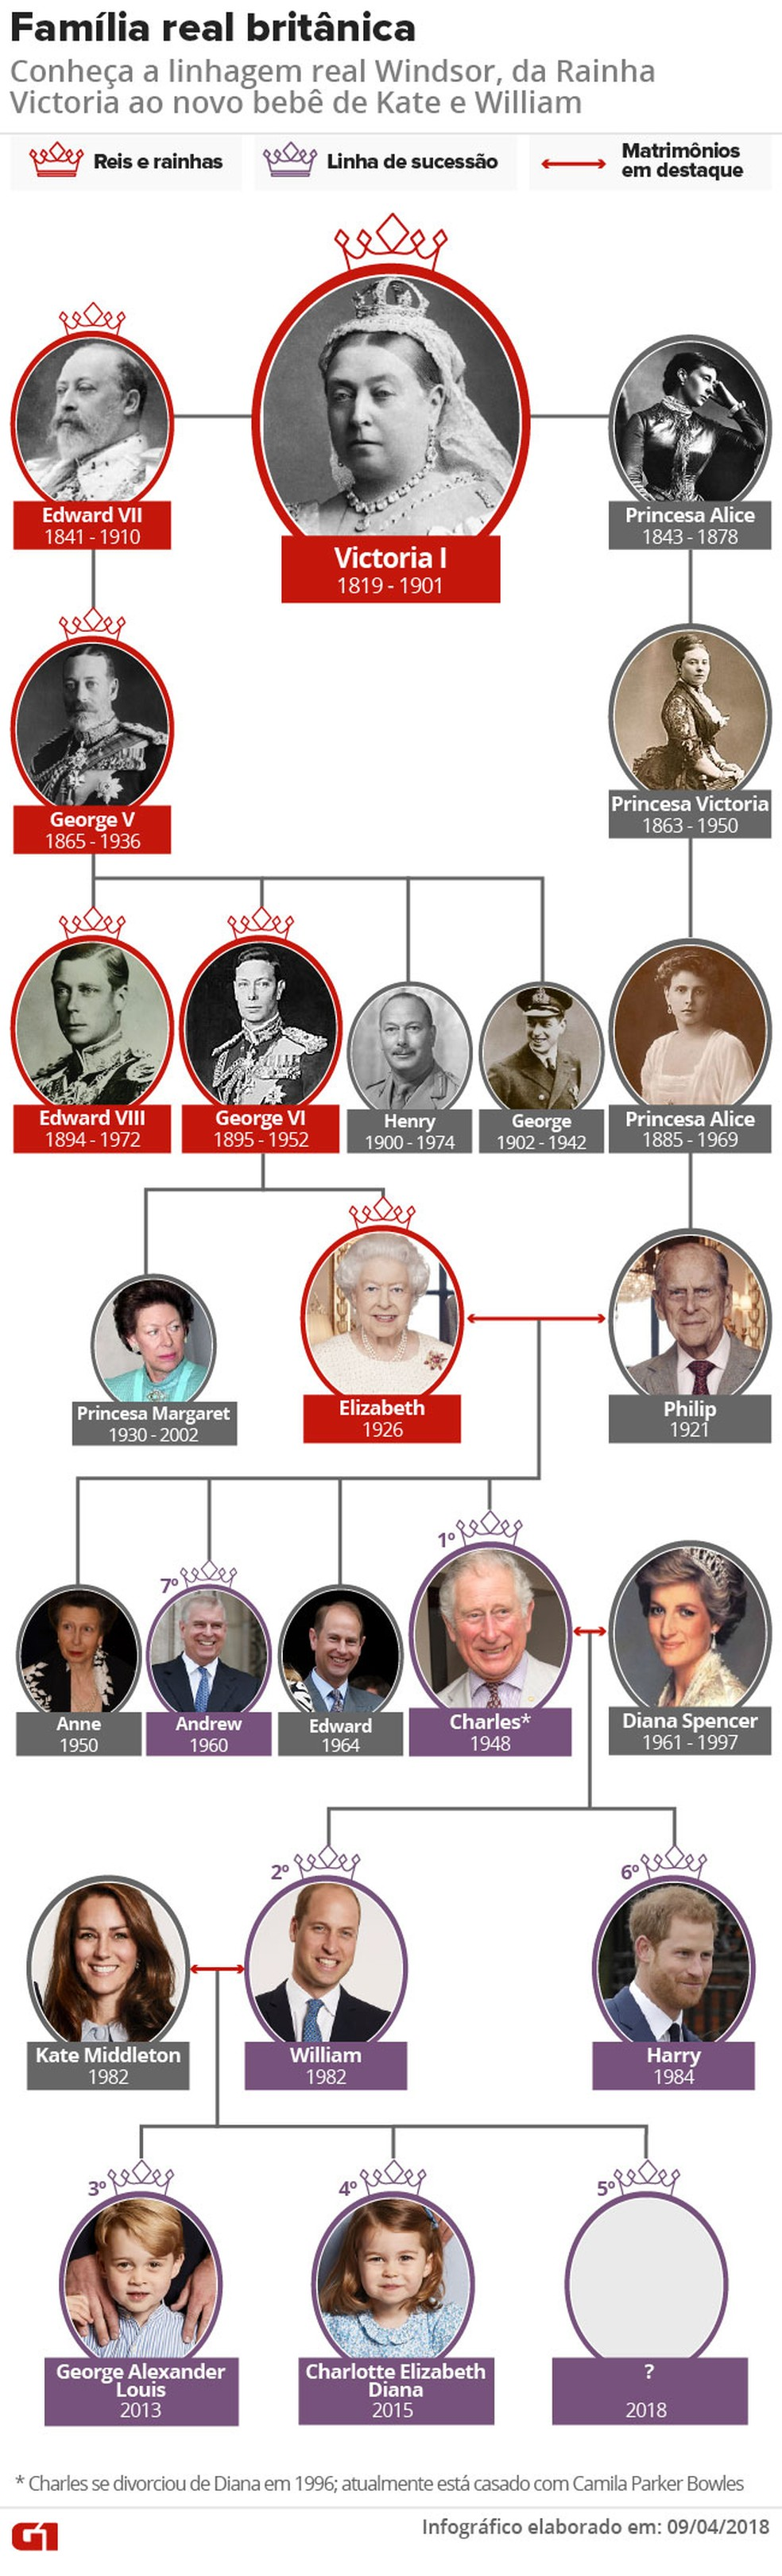 Família real britânica (Foto: Juliene Souza/ Arte G1)